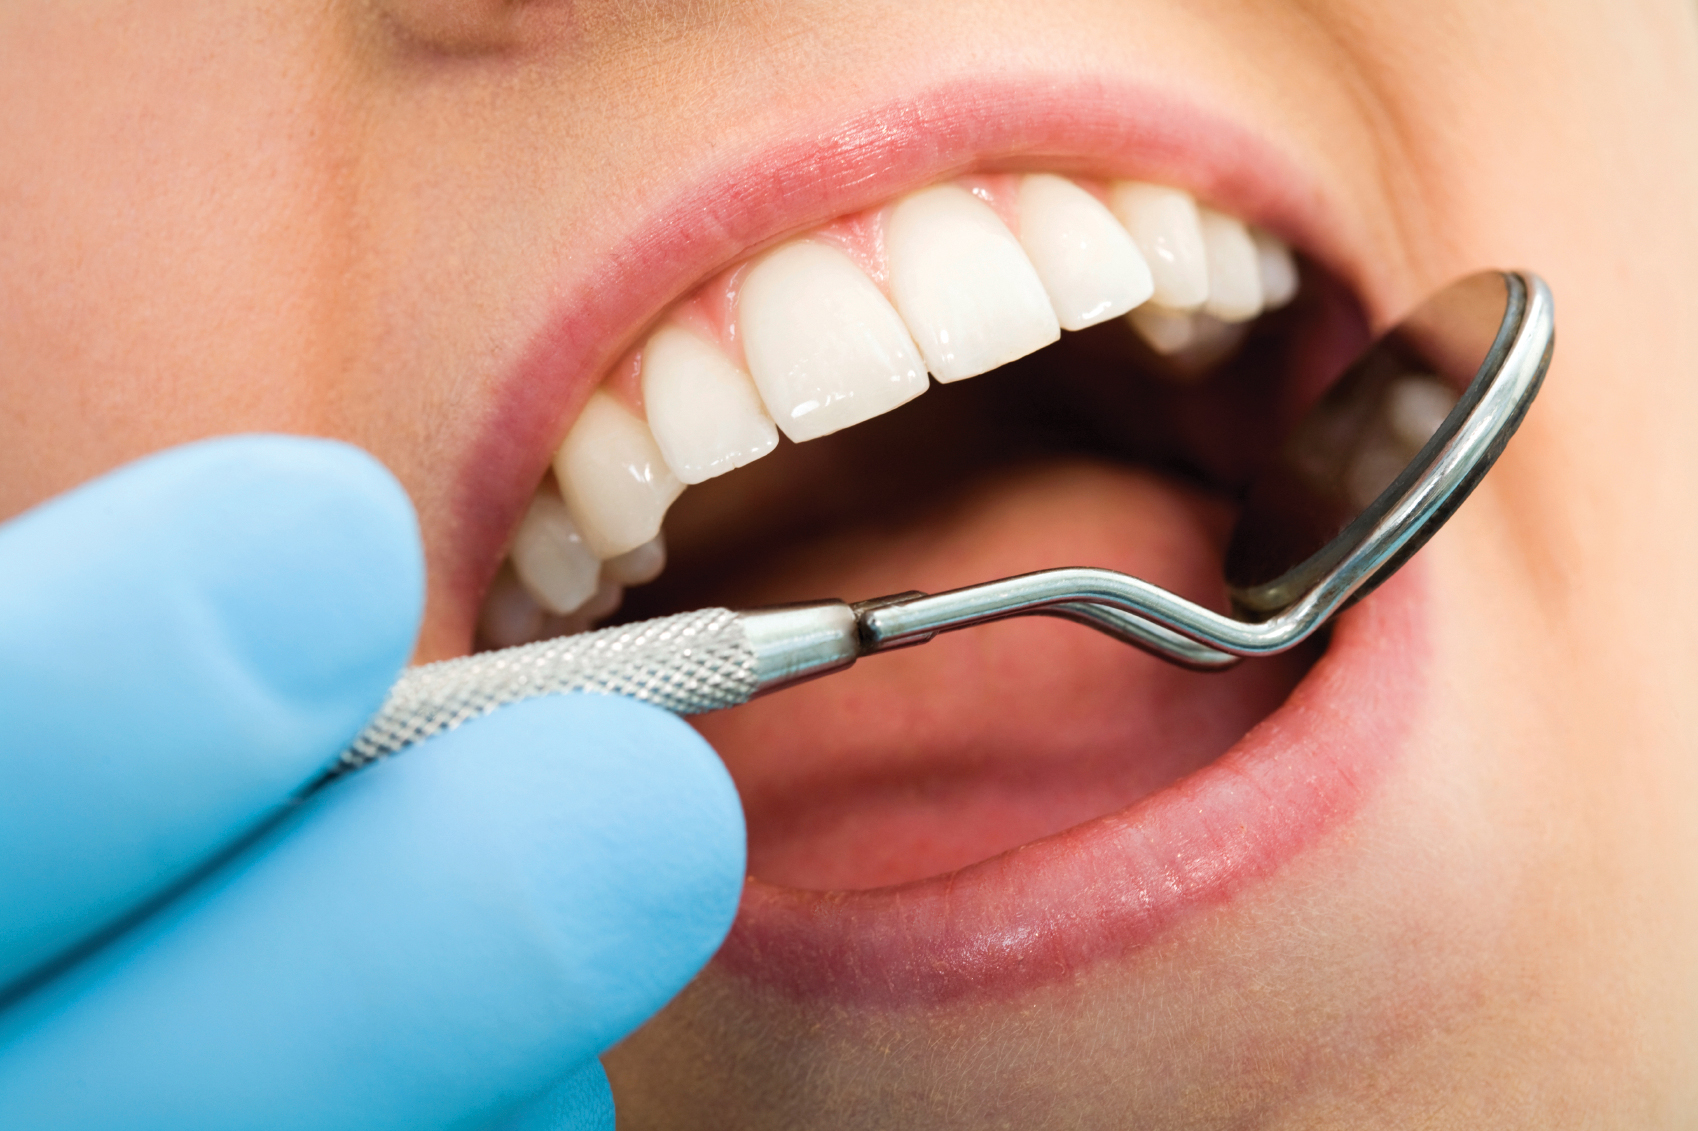 implants dentaires en Tunsiie avec ChirurgiePro